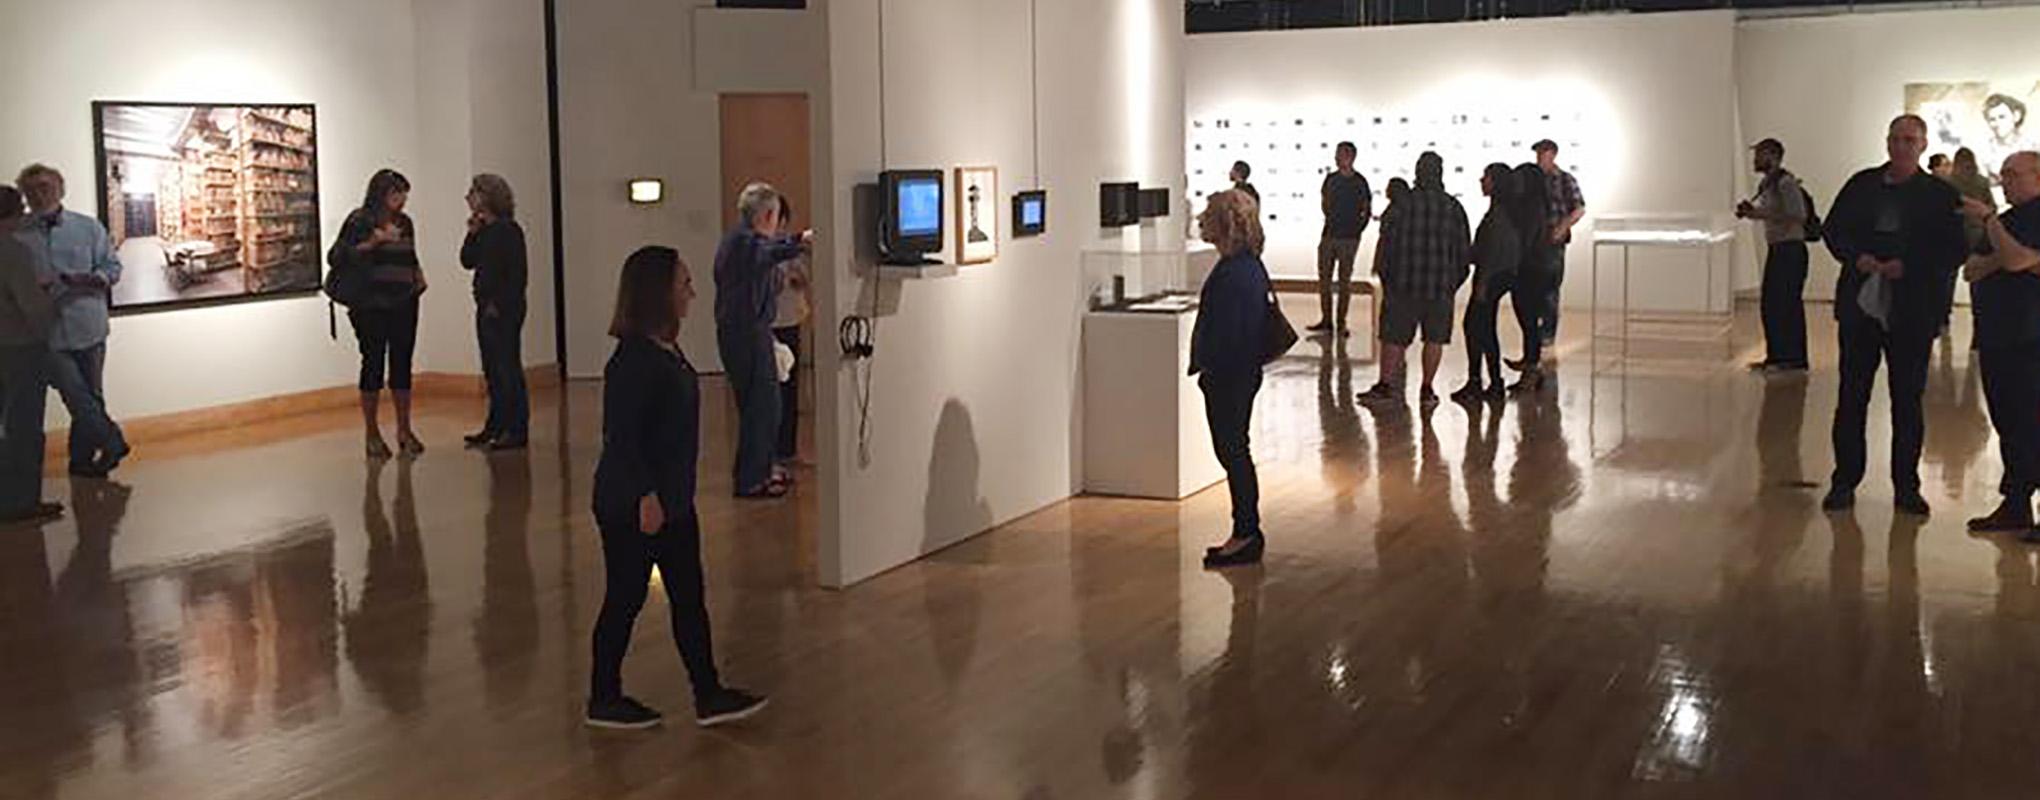 Gallery Opening in Fine Arts Gallery